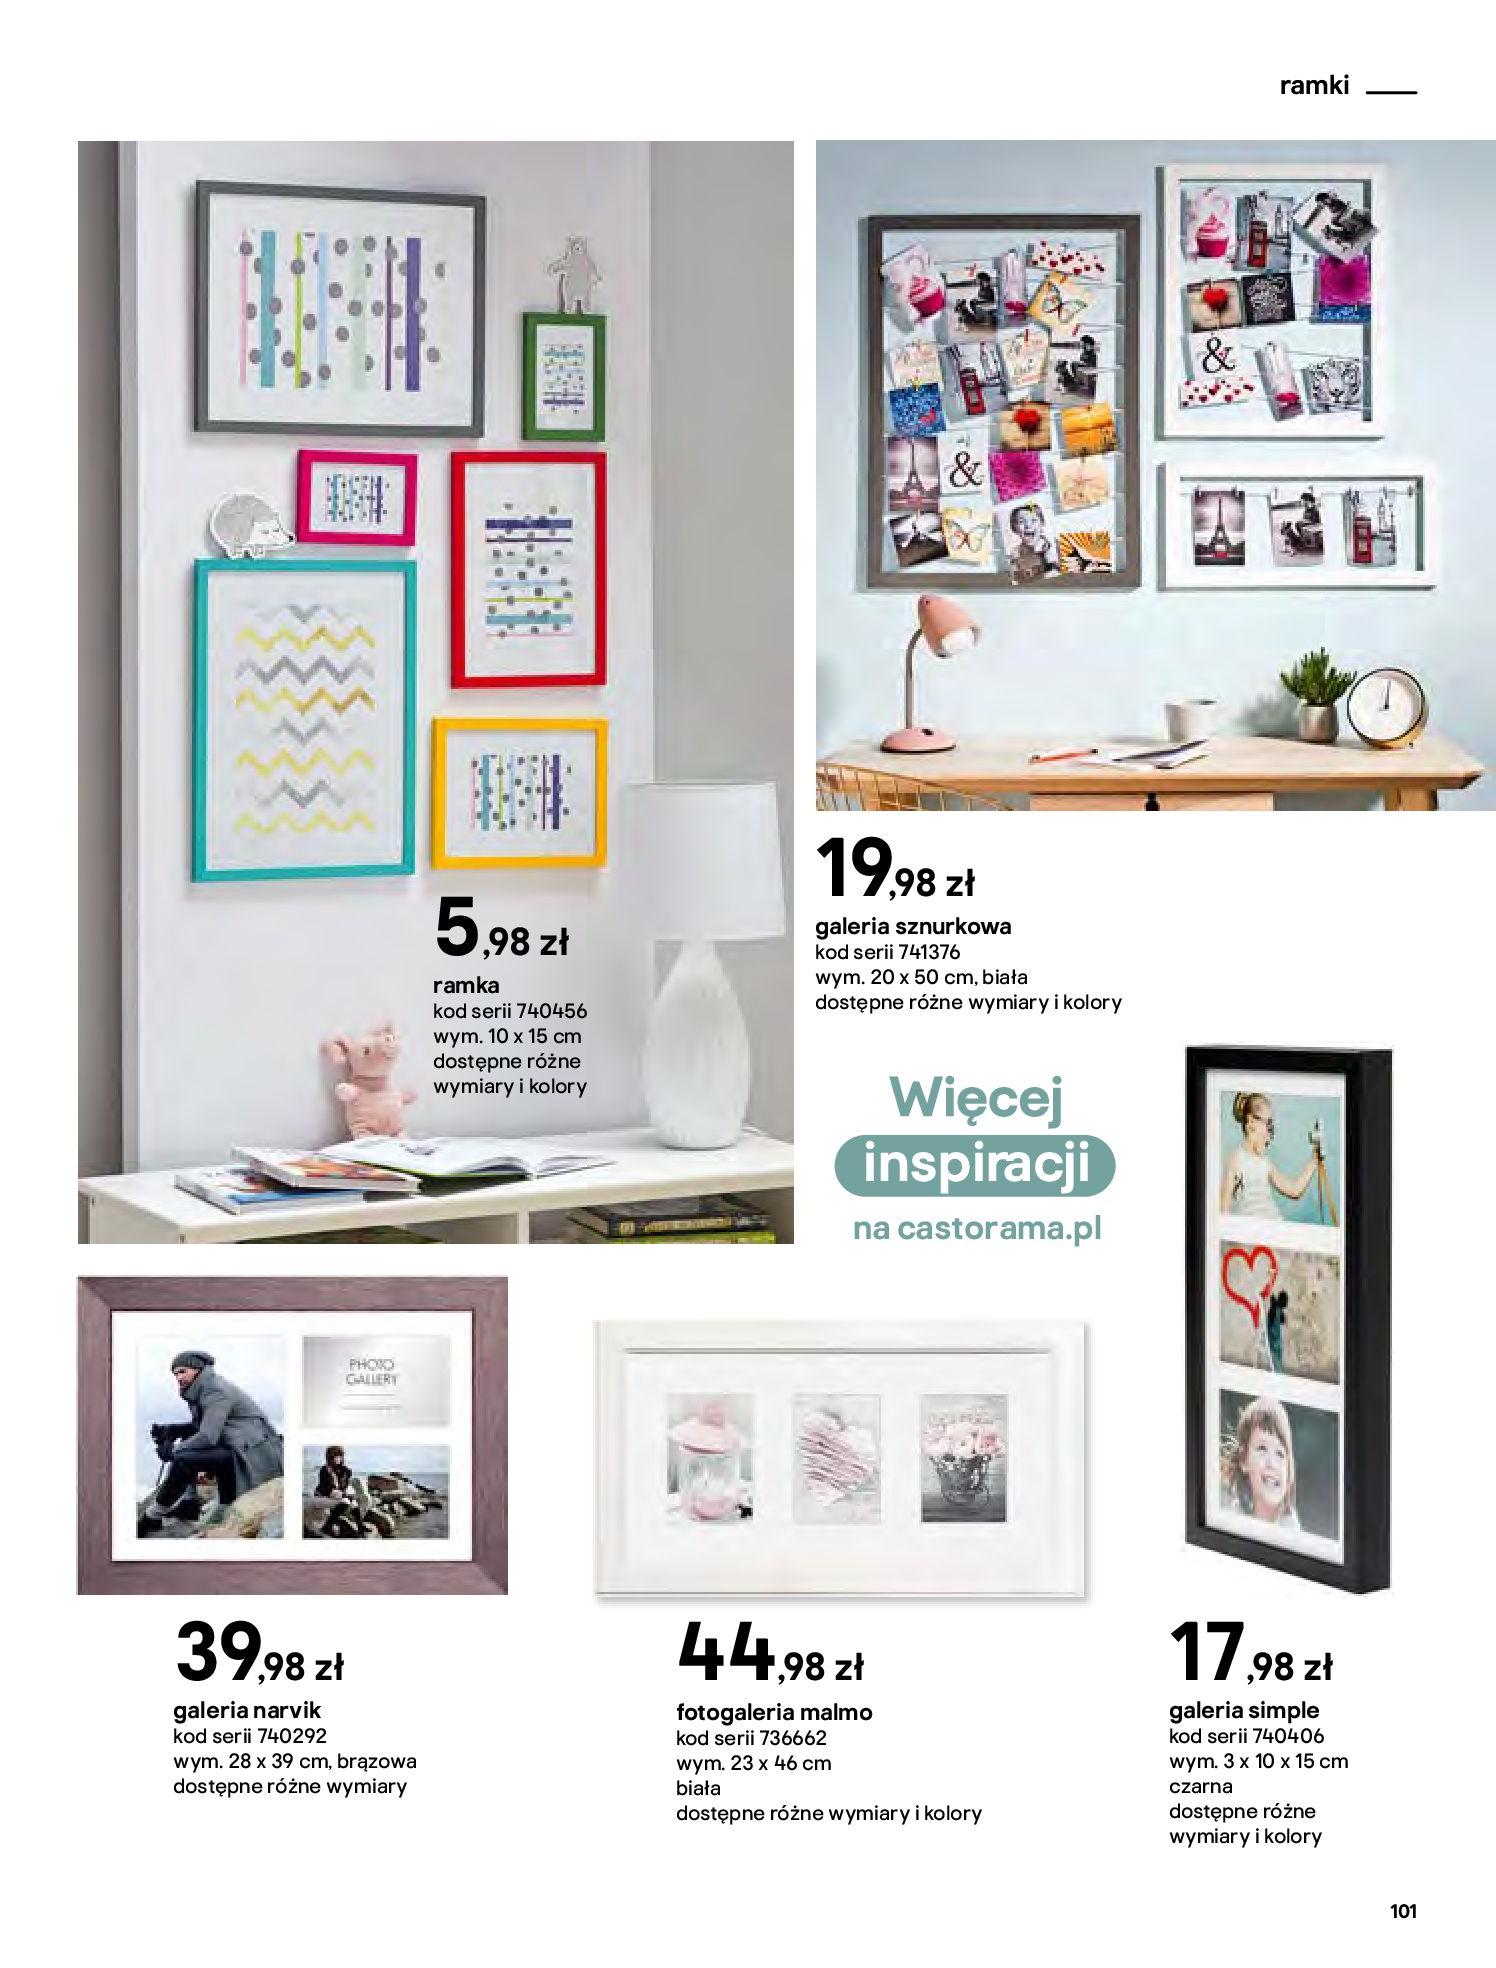 Gazetka Castorama - Katalog Dekoracje-22.10.2020-31.12.2020-page-101